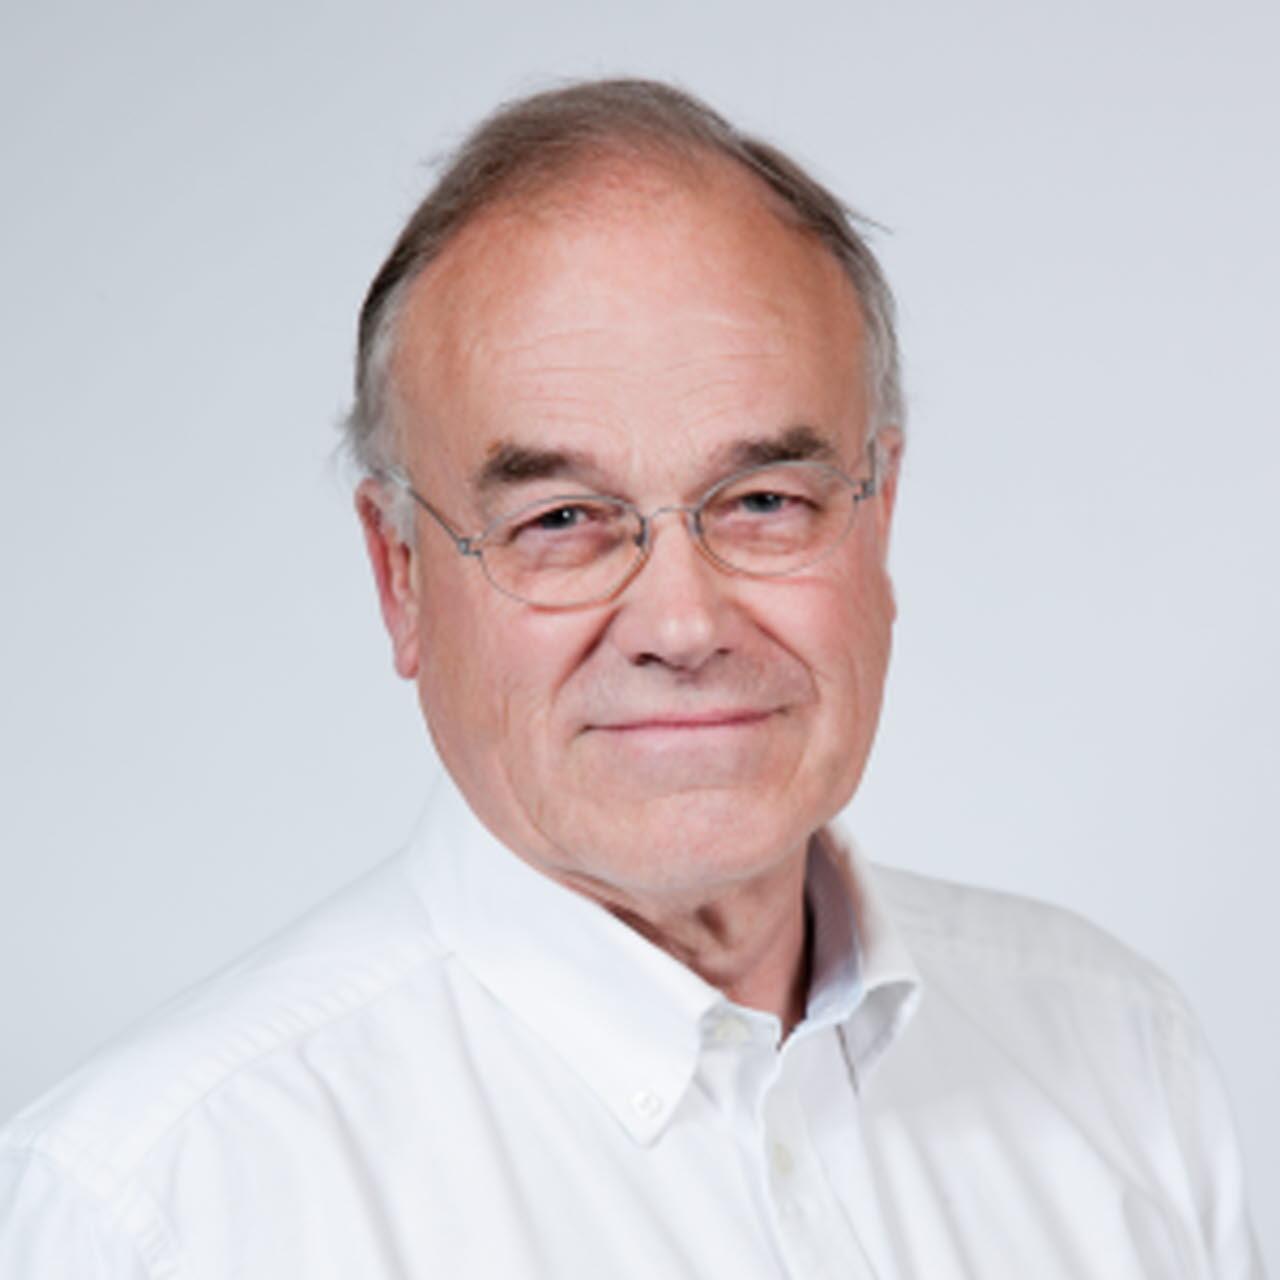 Mr Michael Morrison